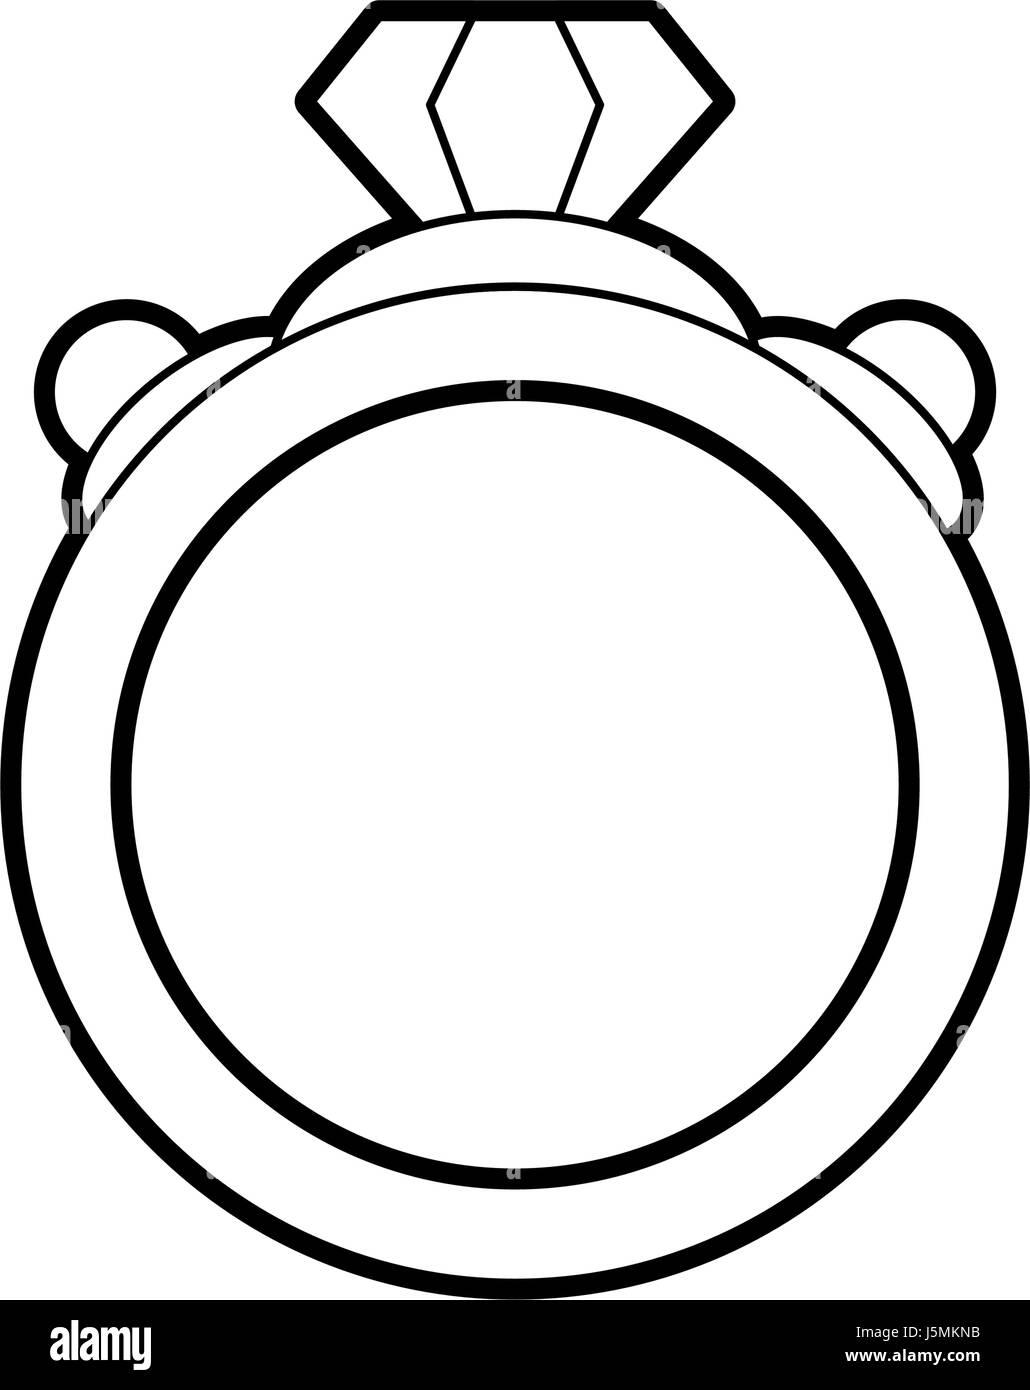 sketch silhouette image diamond engagement ring - Stock Image